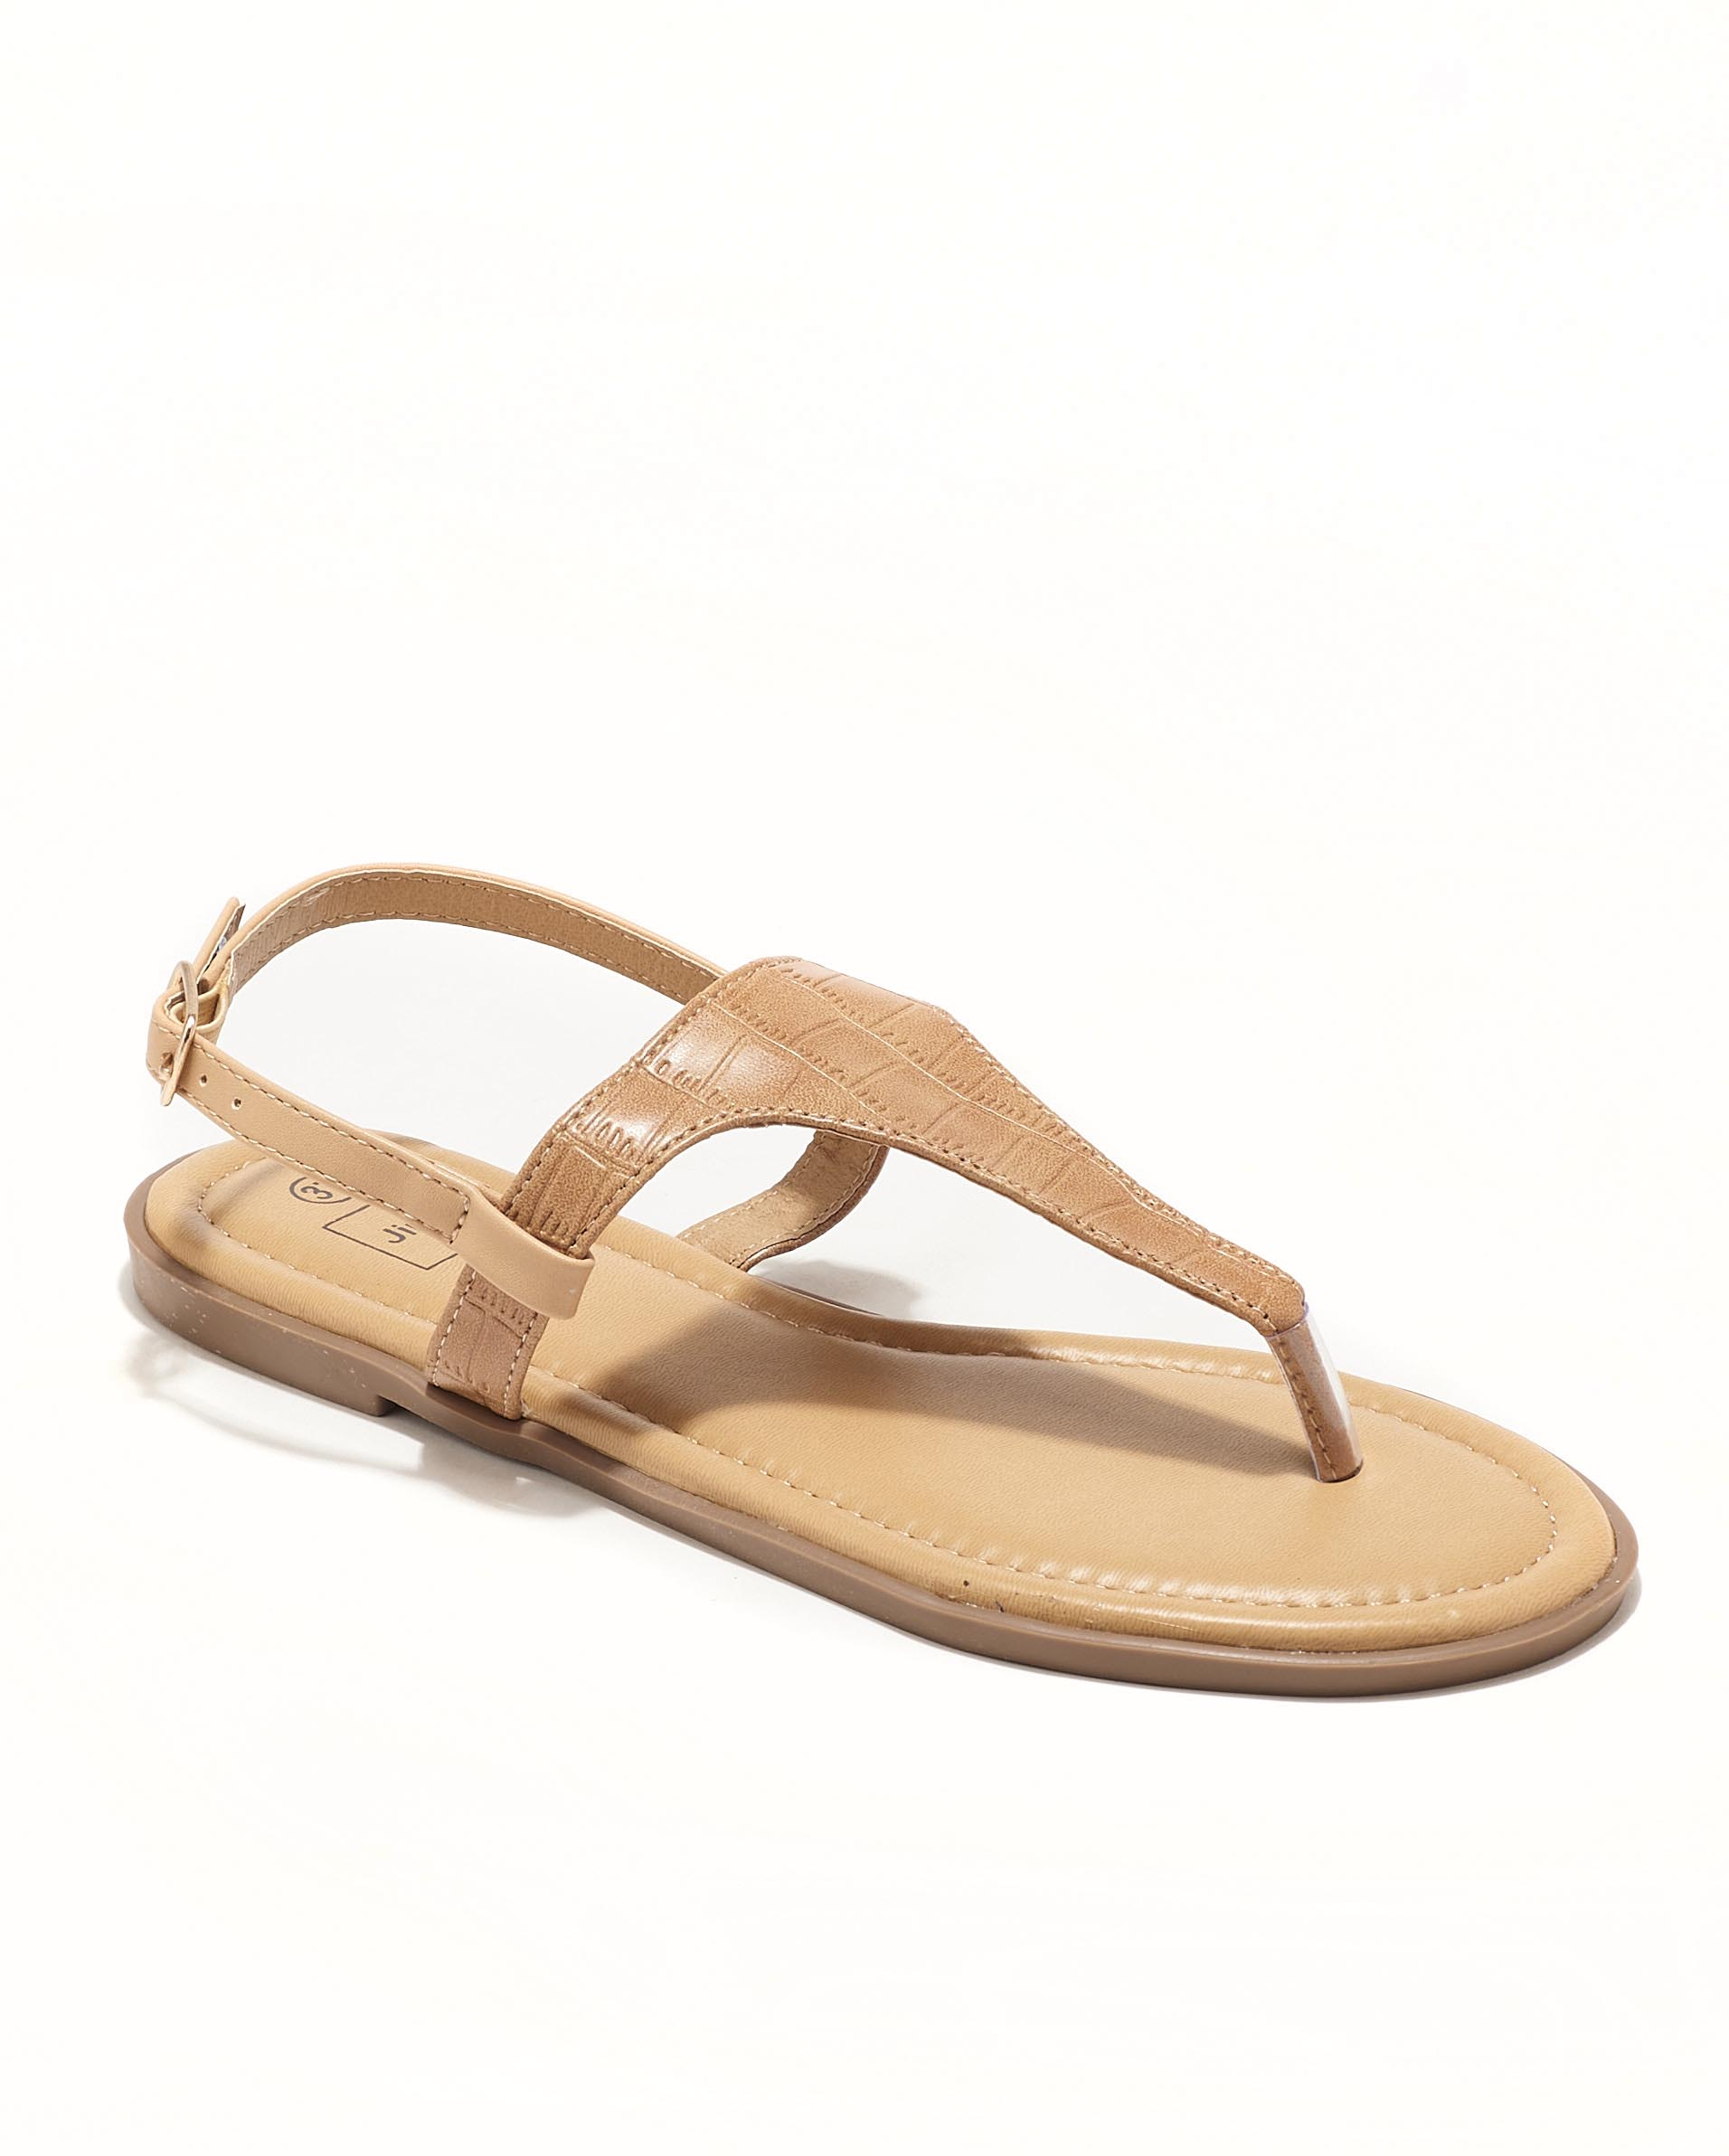 Sandales Plates Femme - Sandale Plate Croco Beige Jina - Style 3 Zh P06